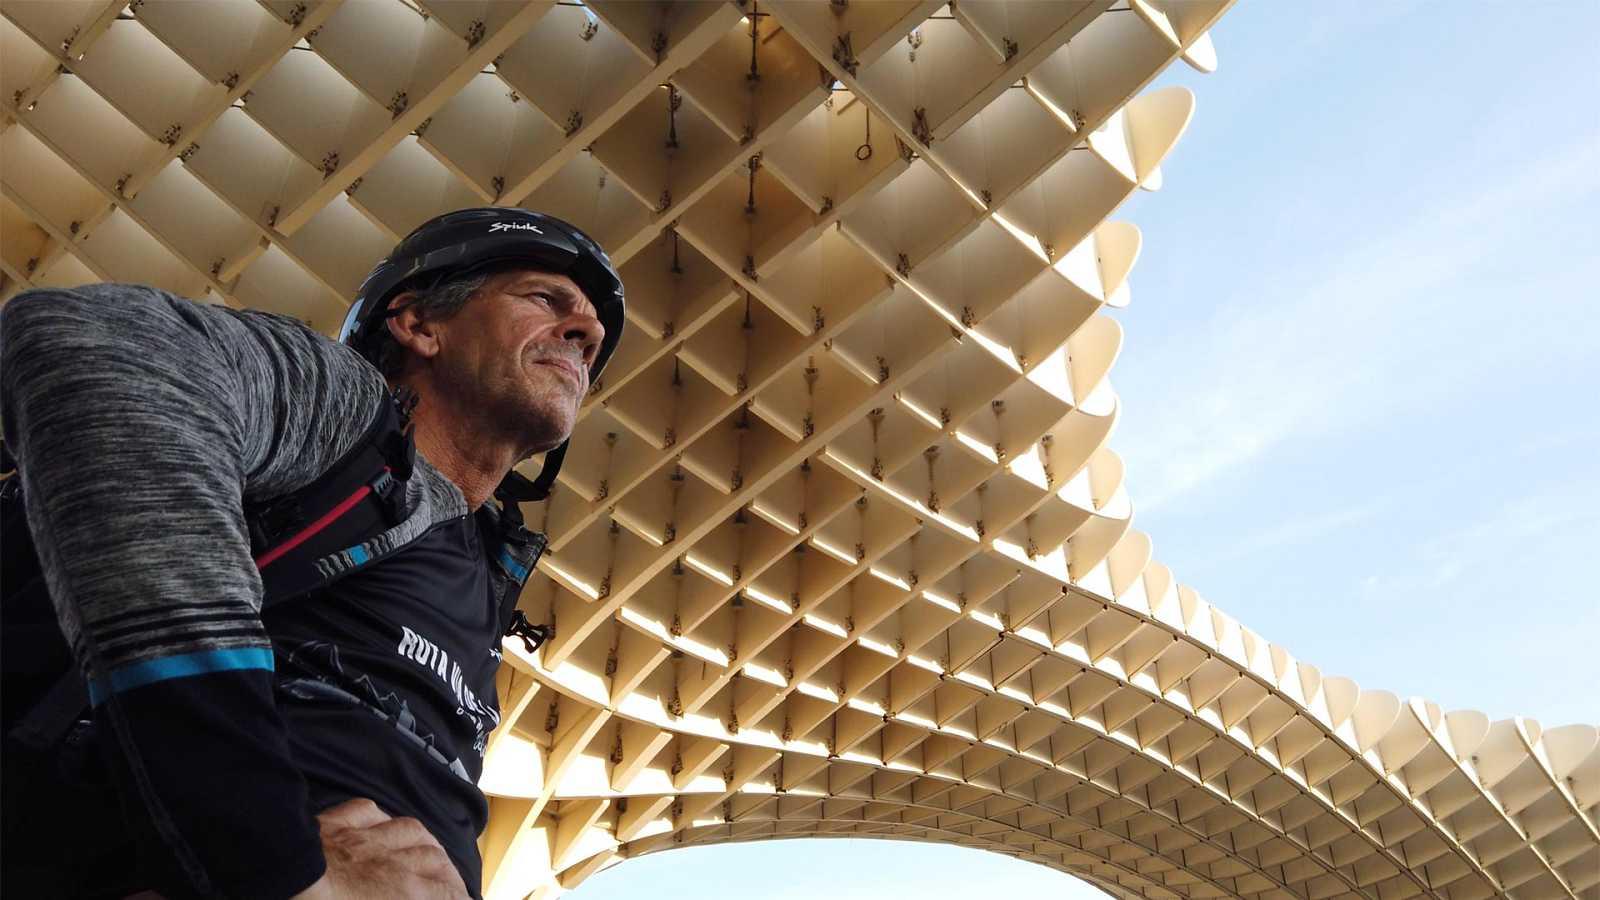 Ruta Vía de la Plata. Diario de un ciclista - Etapa 2: De Lebrija a Torre de la Reina - ver ahora